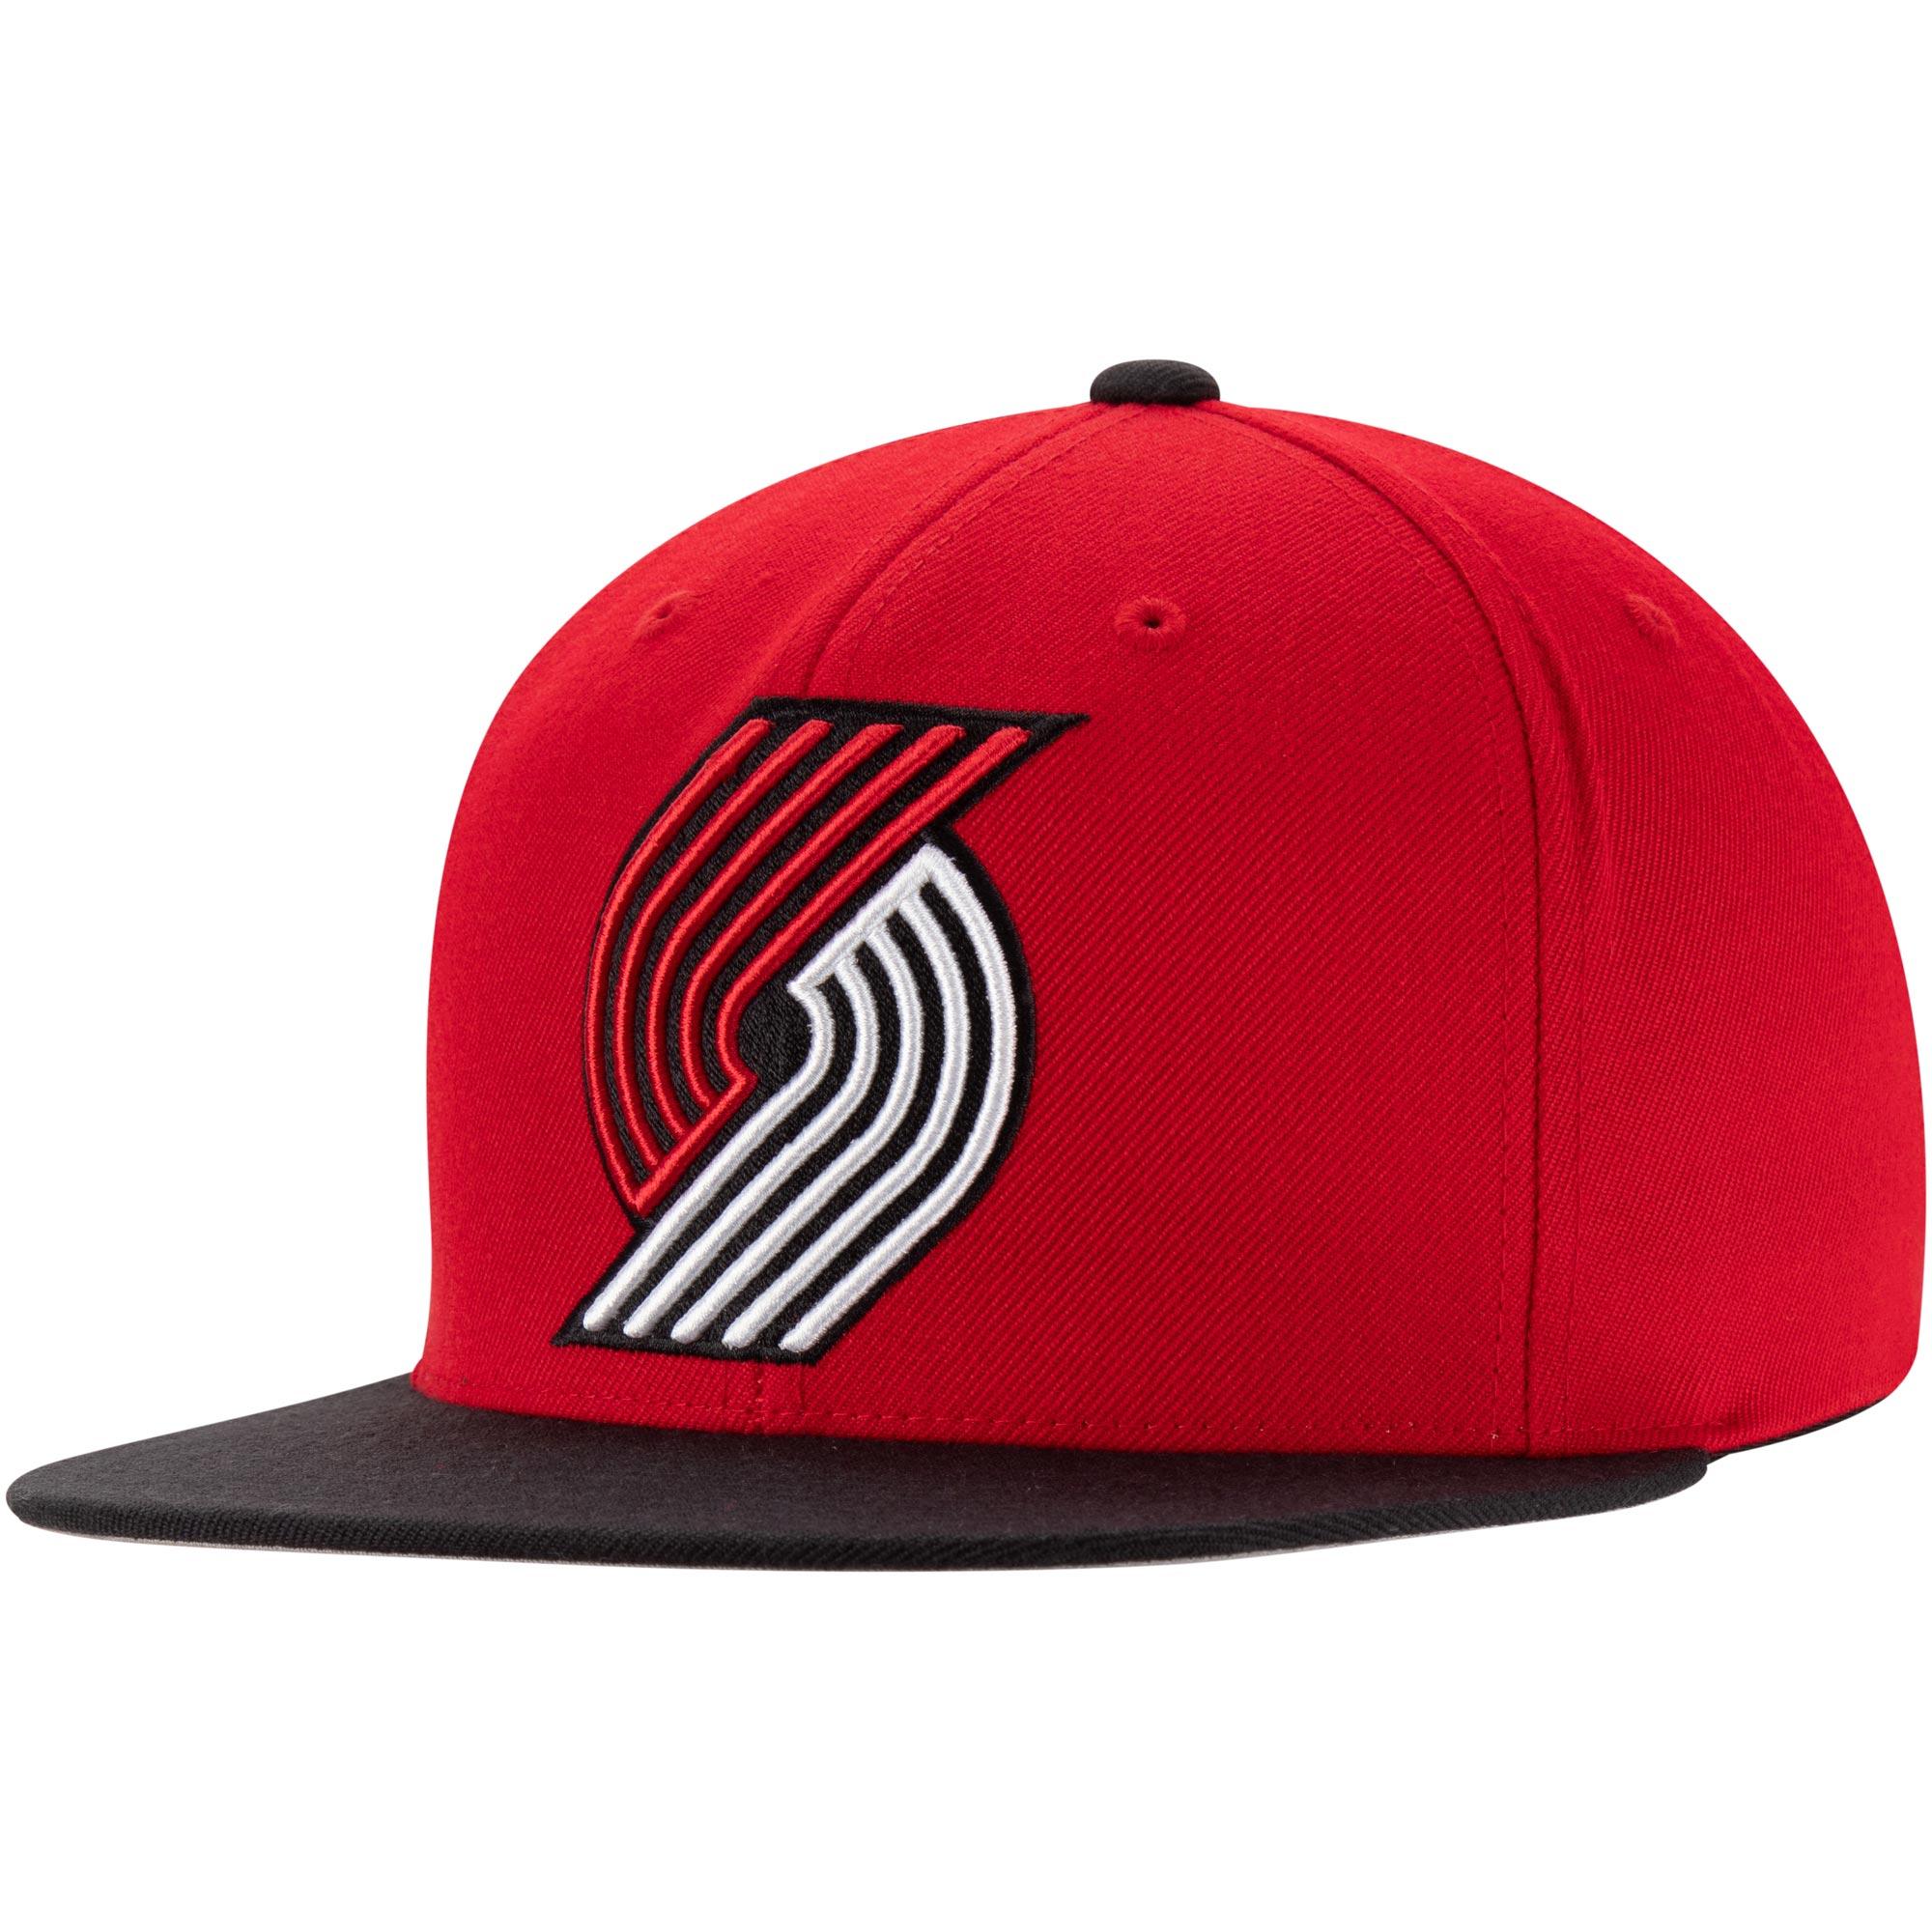 Portland Trail Blazers Mitchell & Ness Two-Tone Wool Snapback Hat - Red/Black